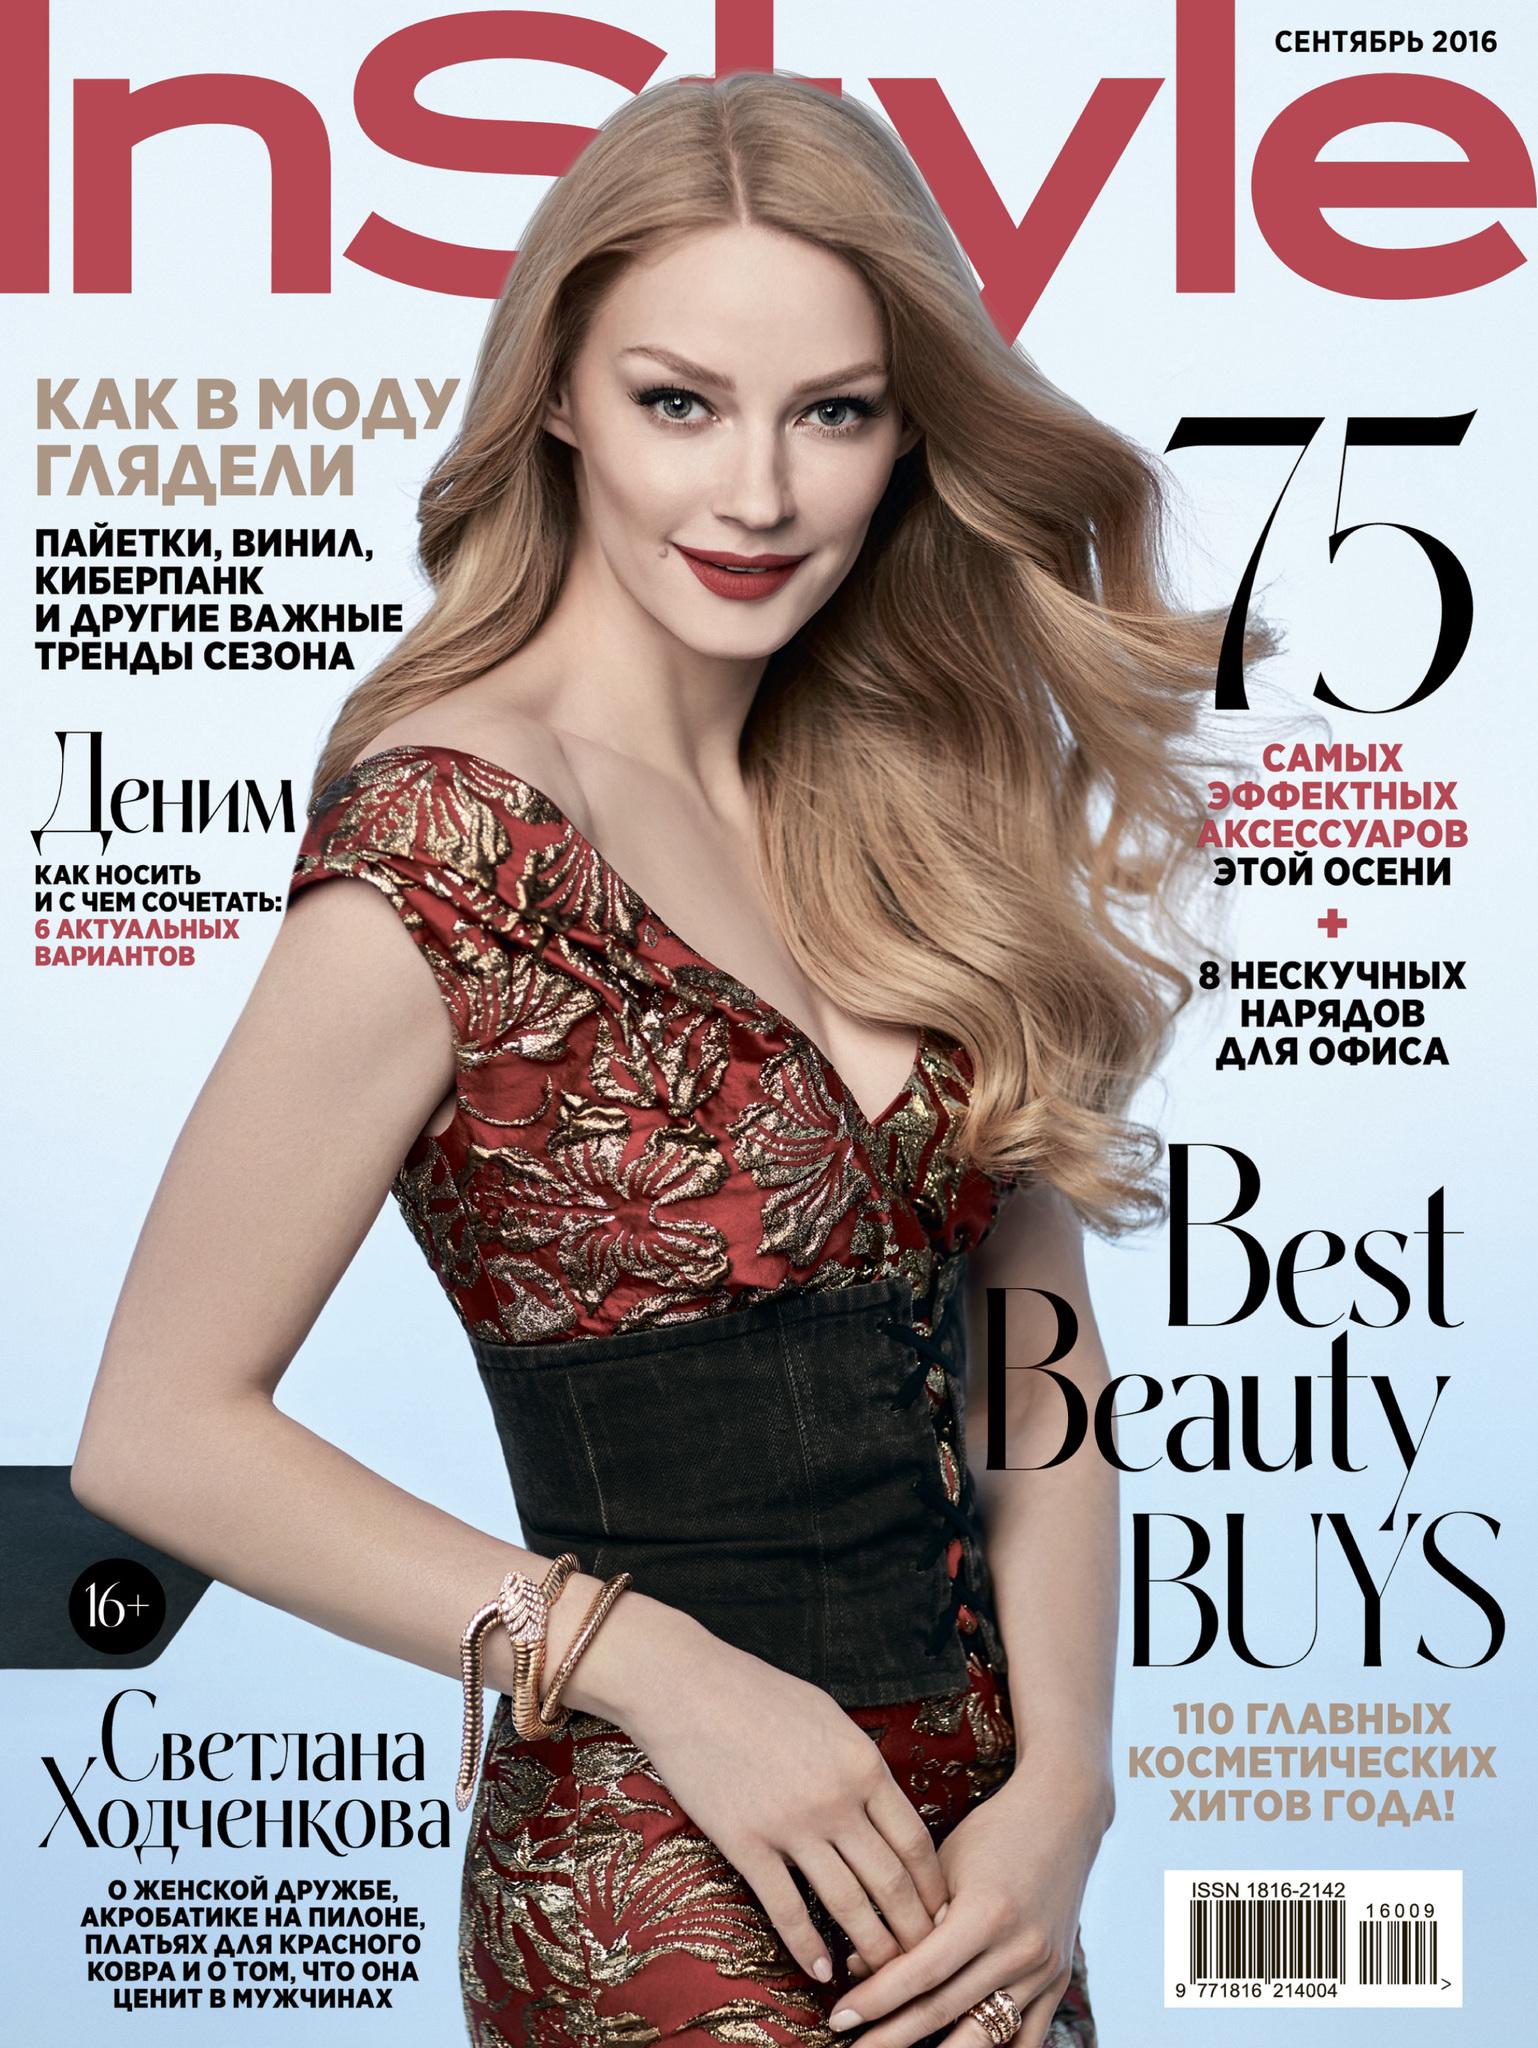 Бренды Maria Francesca Pepe, Miss Bibi и Macon & Lesquoy в InStyle Сентябрь 2016